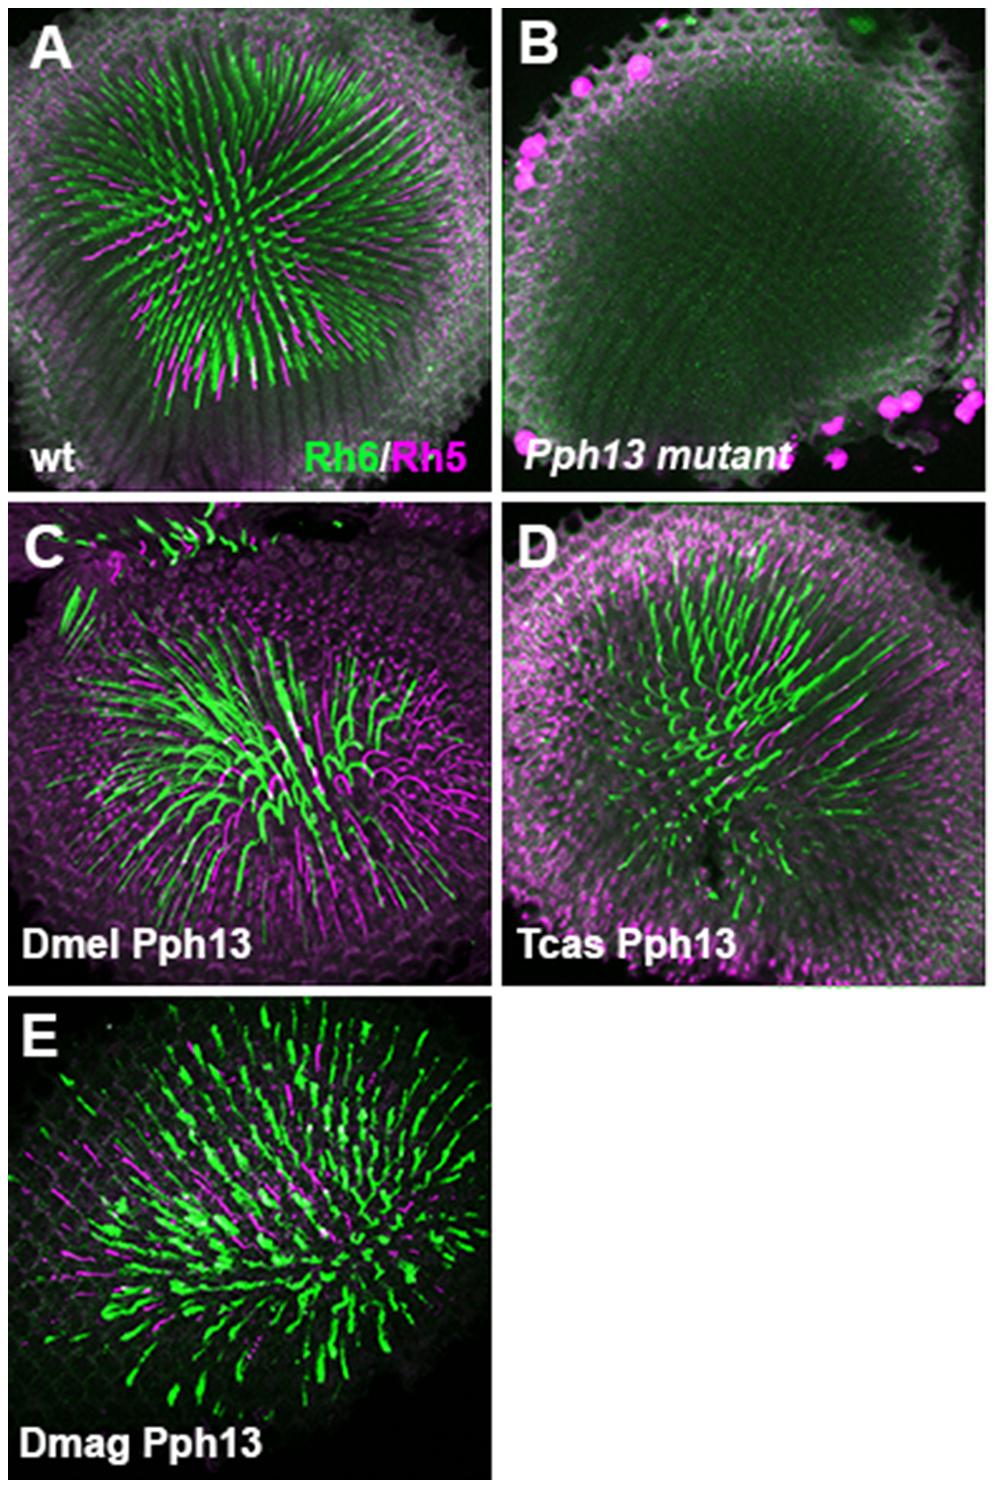 <i>In vivo</i> rescue of opsin expression in <i>Pph13</i> null mutant <i>Drosophila</i>.